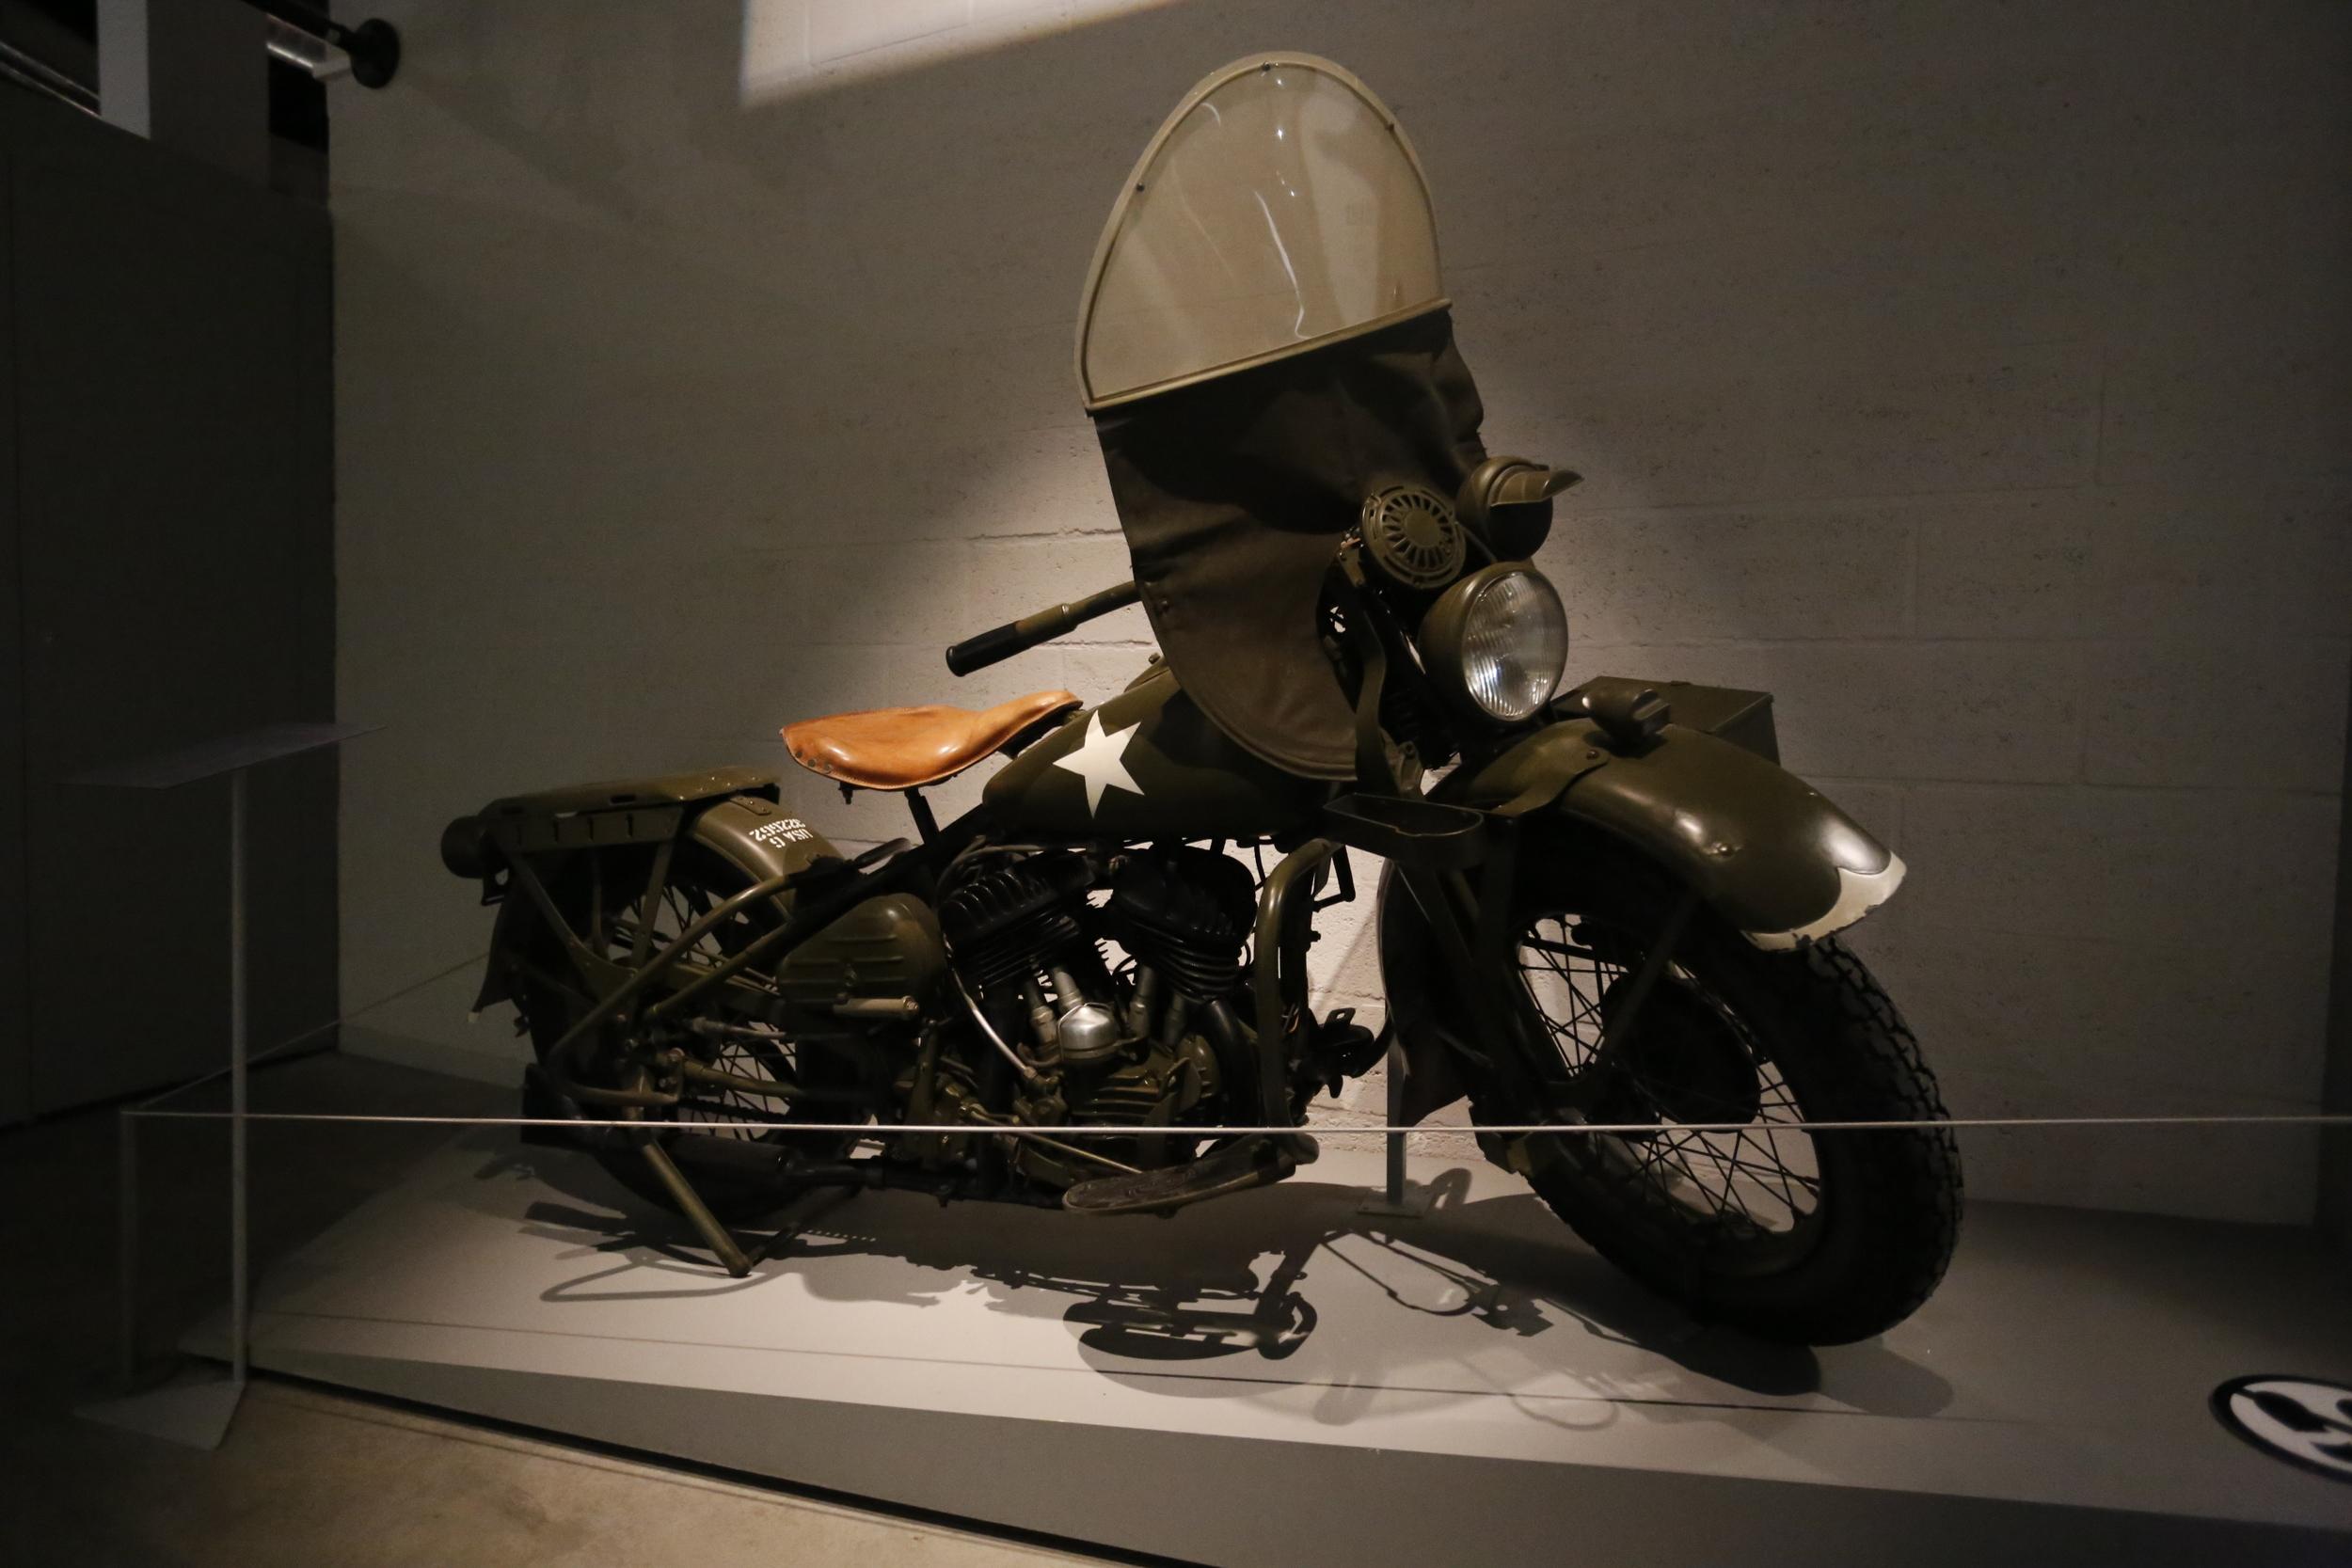 motorbike, vintage motorbike, classic motorbike, harley, harley davidson, biker, bikers, bastogne, bastogne belgium, belgium, war museum, WWII, visit belgium, bicycle touring apocalypse